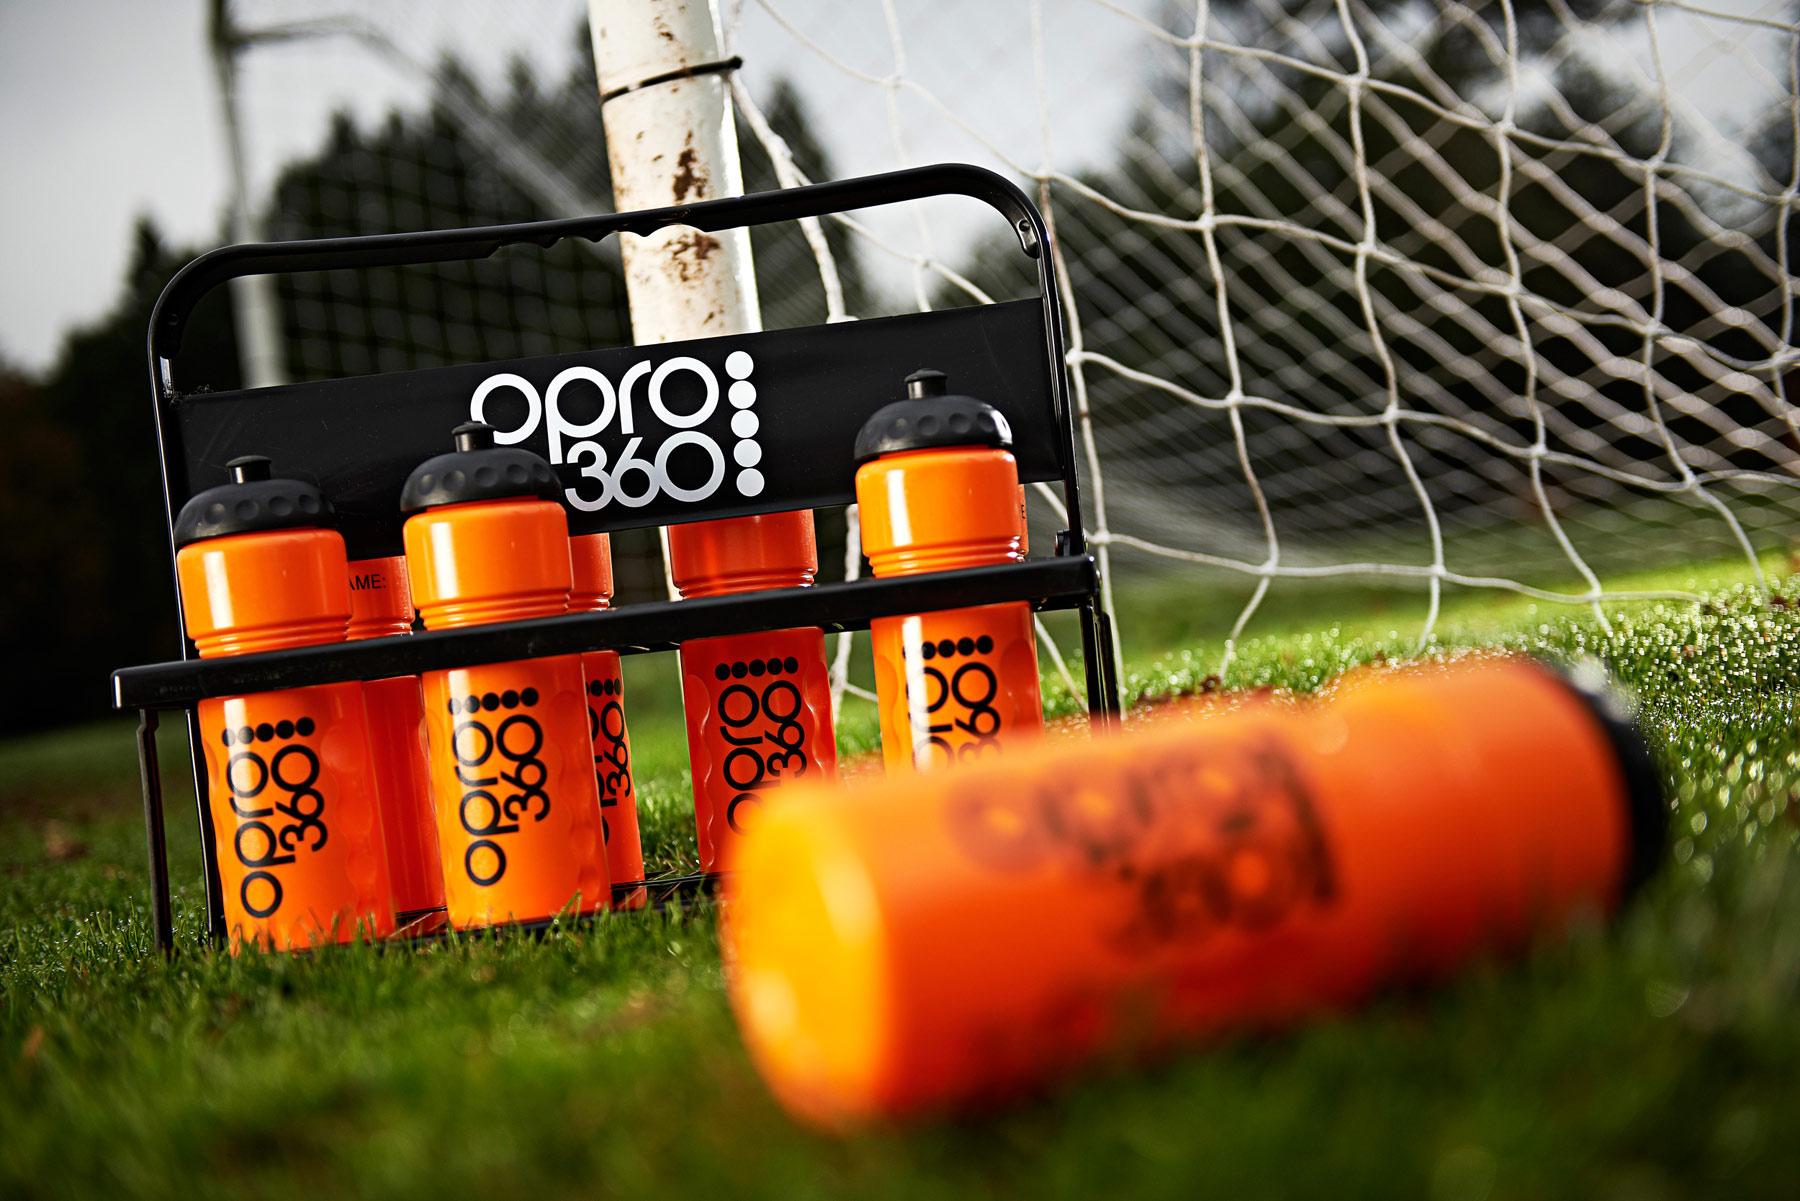 OPRO 360 water bottles